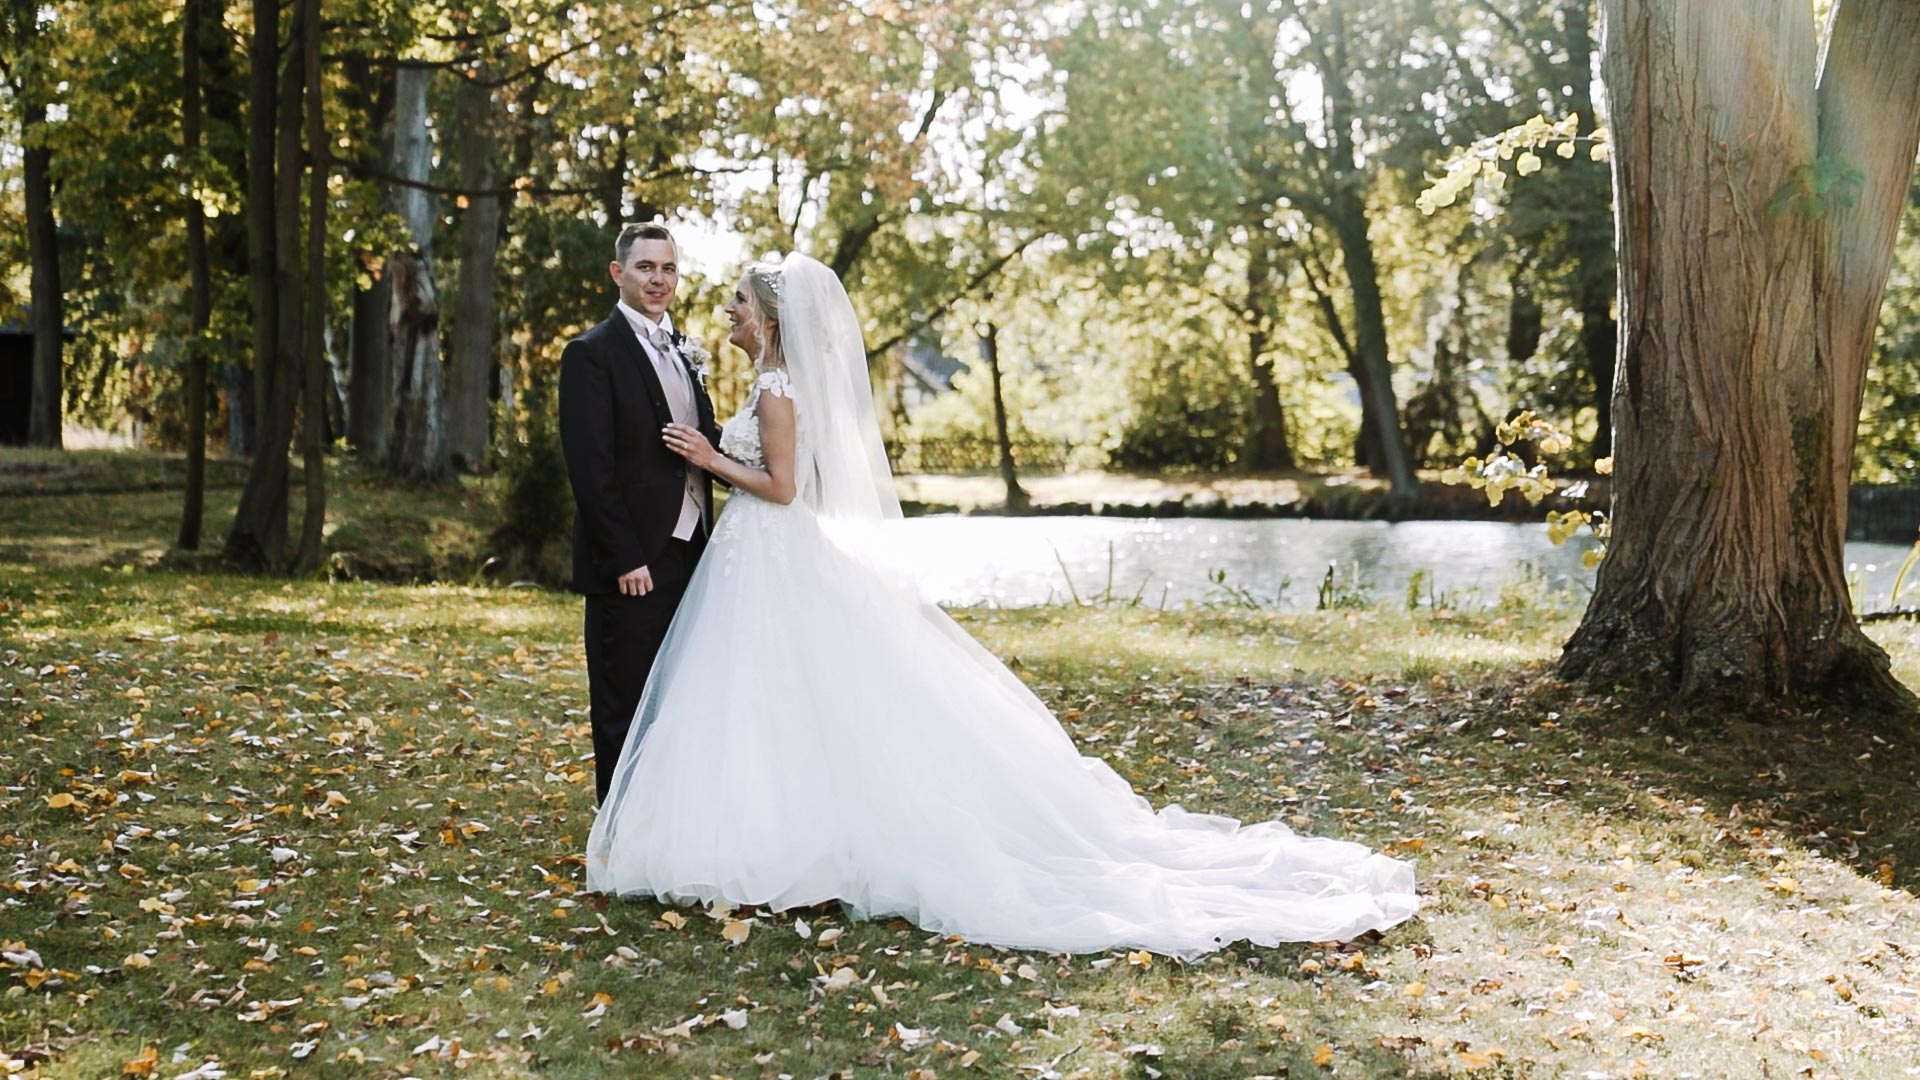 Pascal & Jenny Hochzeitsfilm Schloss Vettelhoven Videograf Hochzeit Filmemacher 019